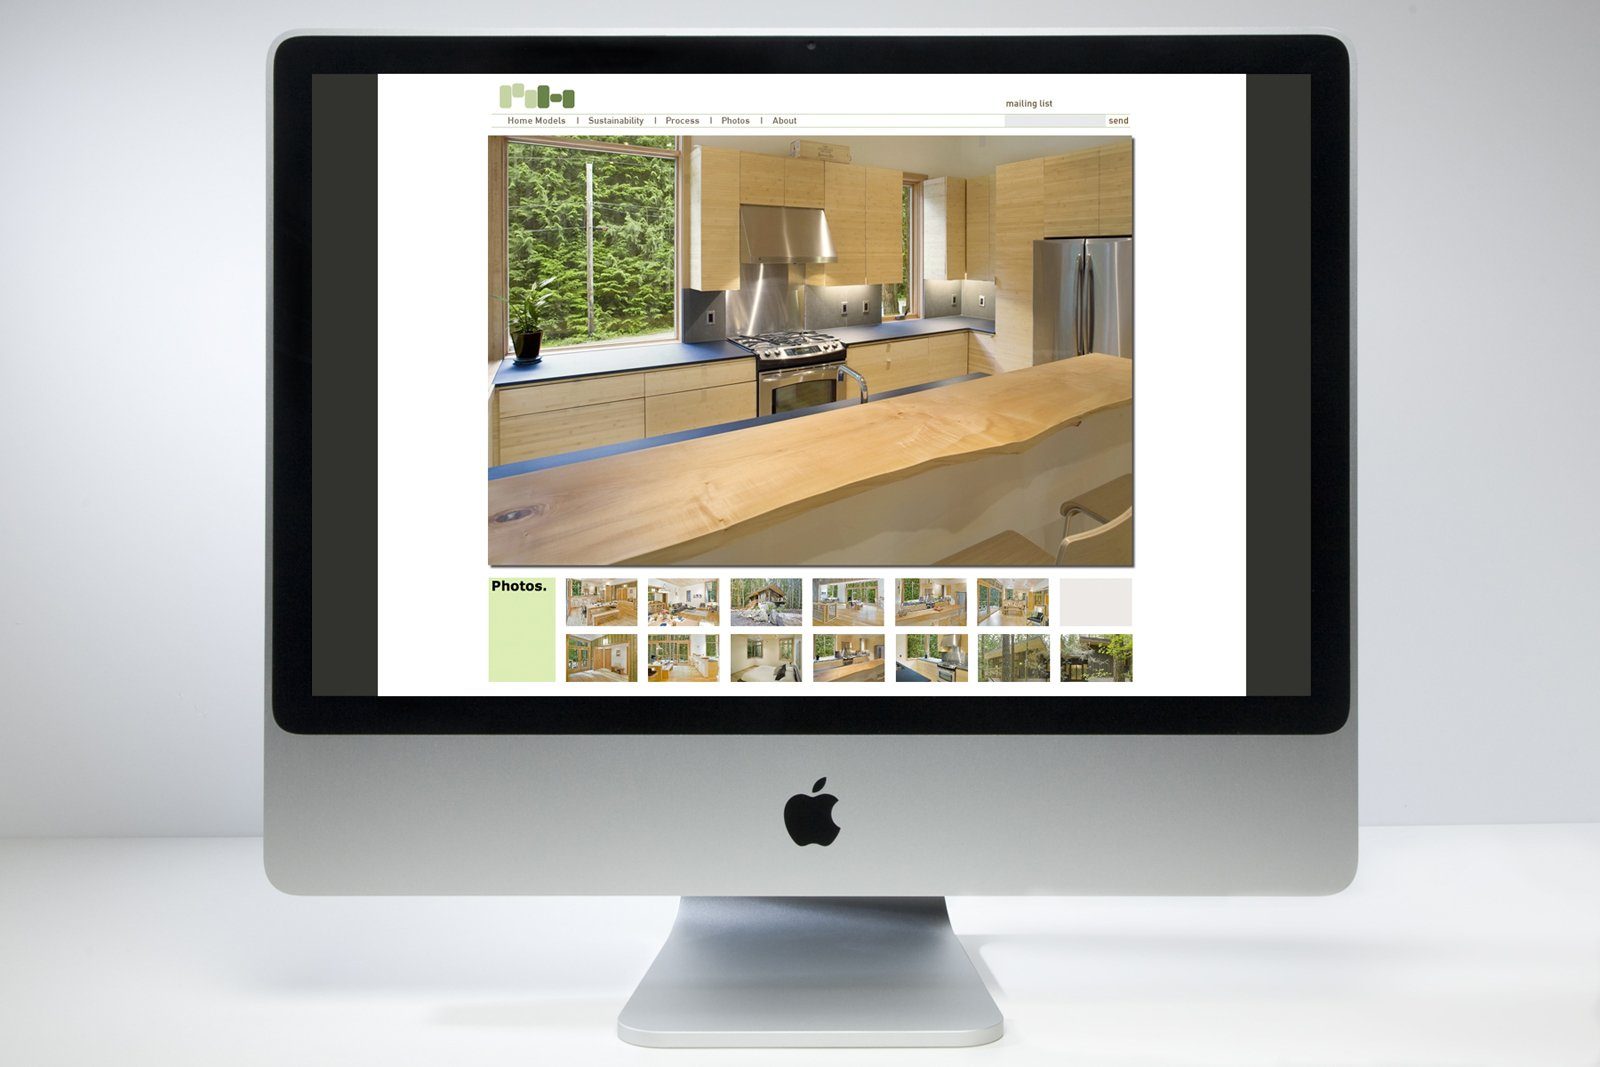 "Method Homes website design by Autograph  Search ""완도출장마사지-출장안마-출장-출장서비스 완도콜걸 출장샵 { ㅋr톡bc288 }  주소{ ☻sannhu,com }  완도 출장여대생 만남 출장만남 업소 타이마사지 출장샵추천 업소  완도출장샵 출장서비스 출장업소"" from Q&A with Autograph Creative Directors"